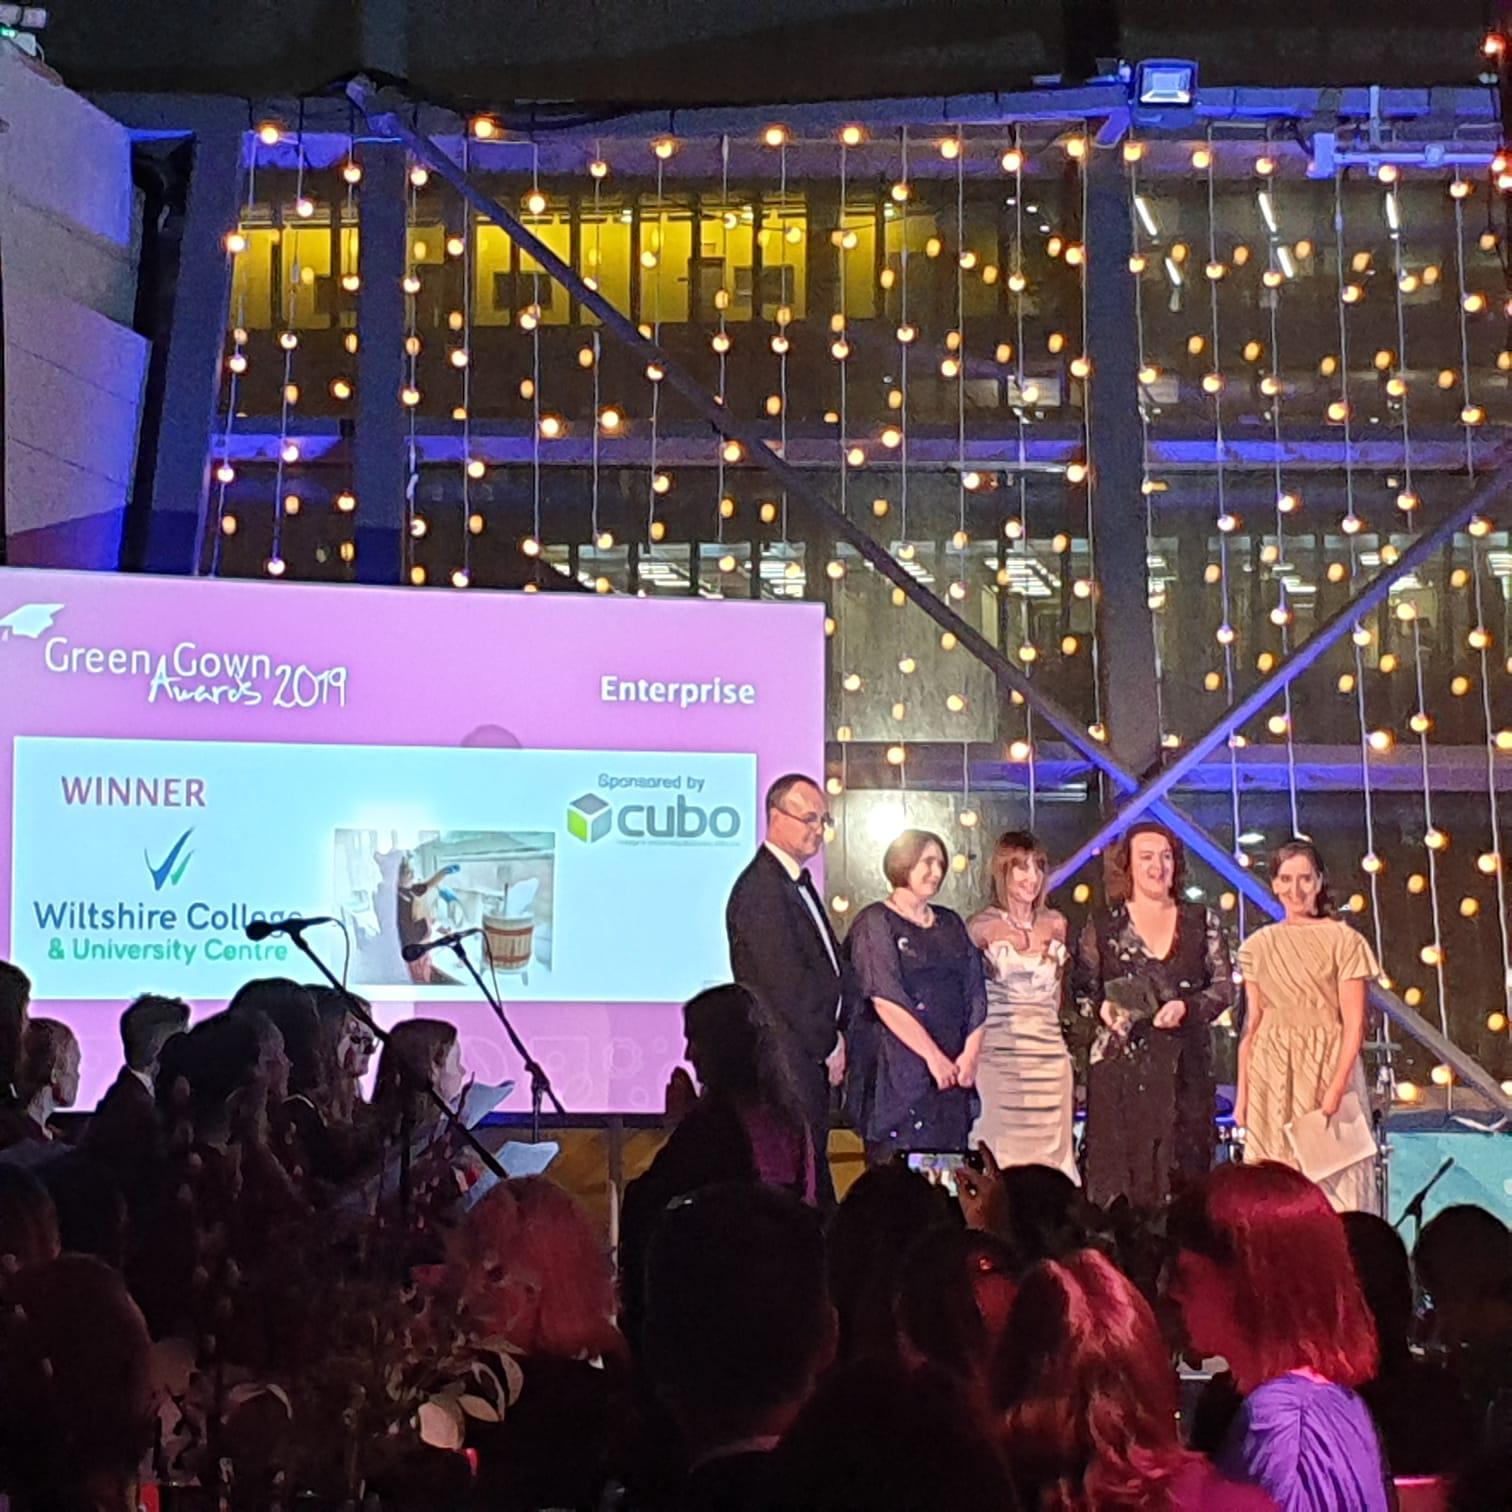 Photo (SOS-UK): Wiltshire College, Green Gown Enterprise Award Winners, 2019